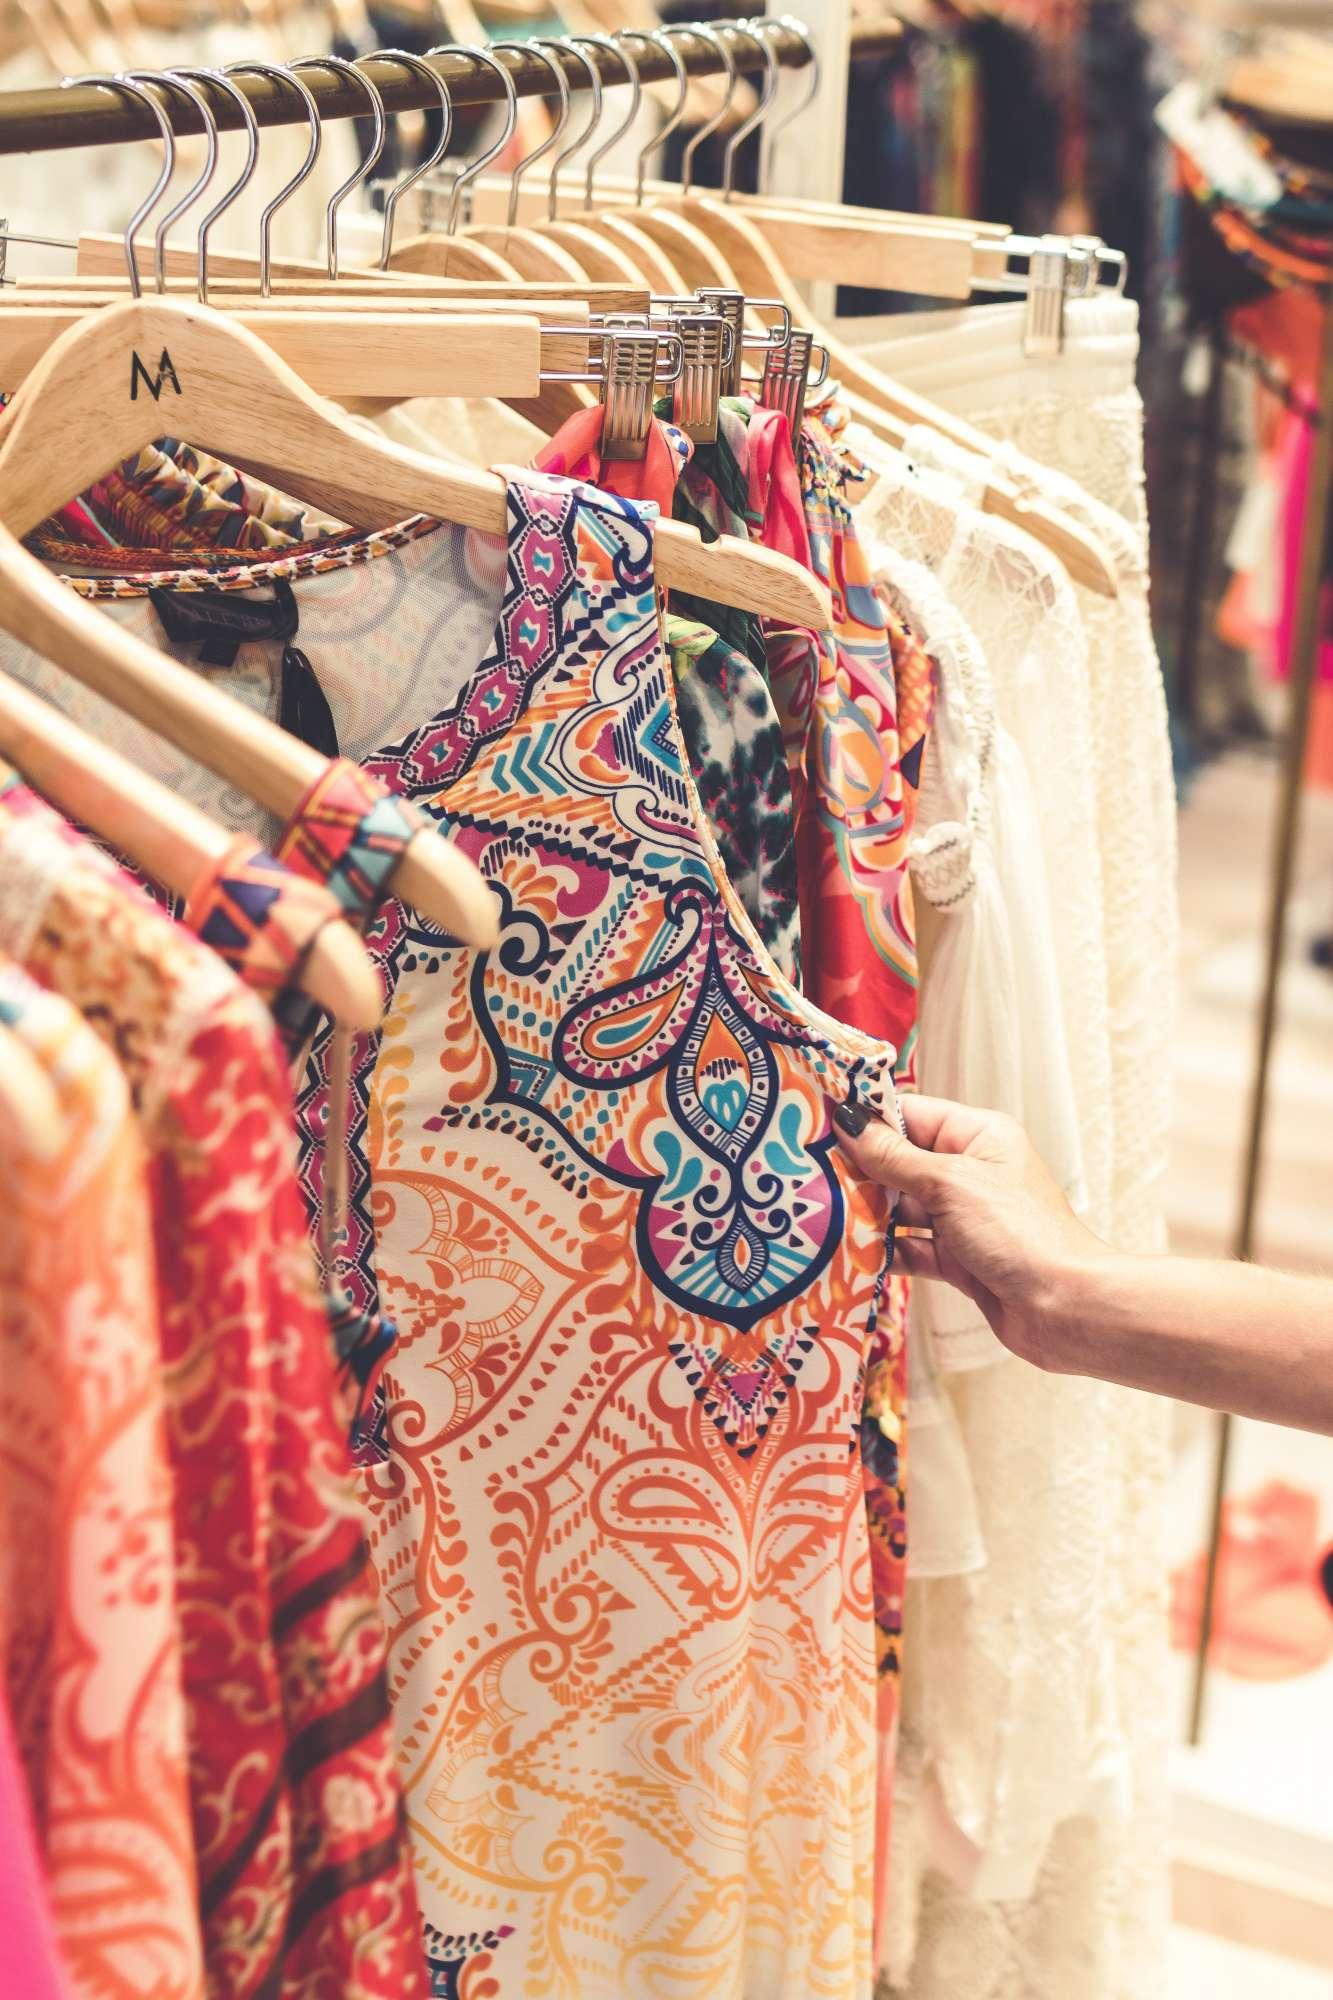 Thrift Shop Clothes Salem, MA